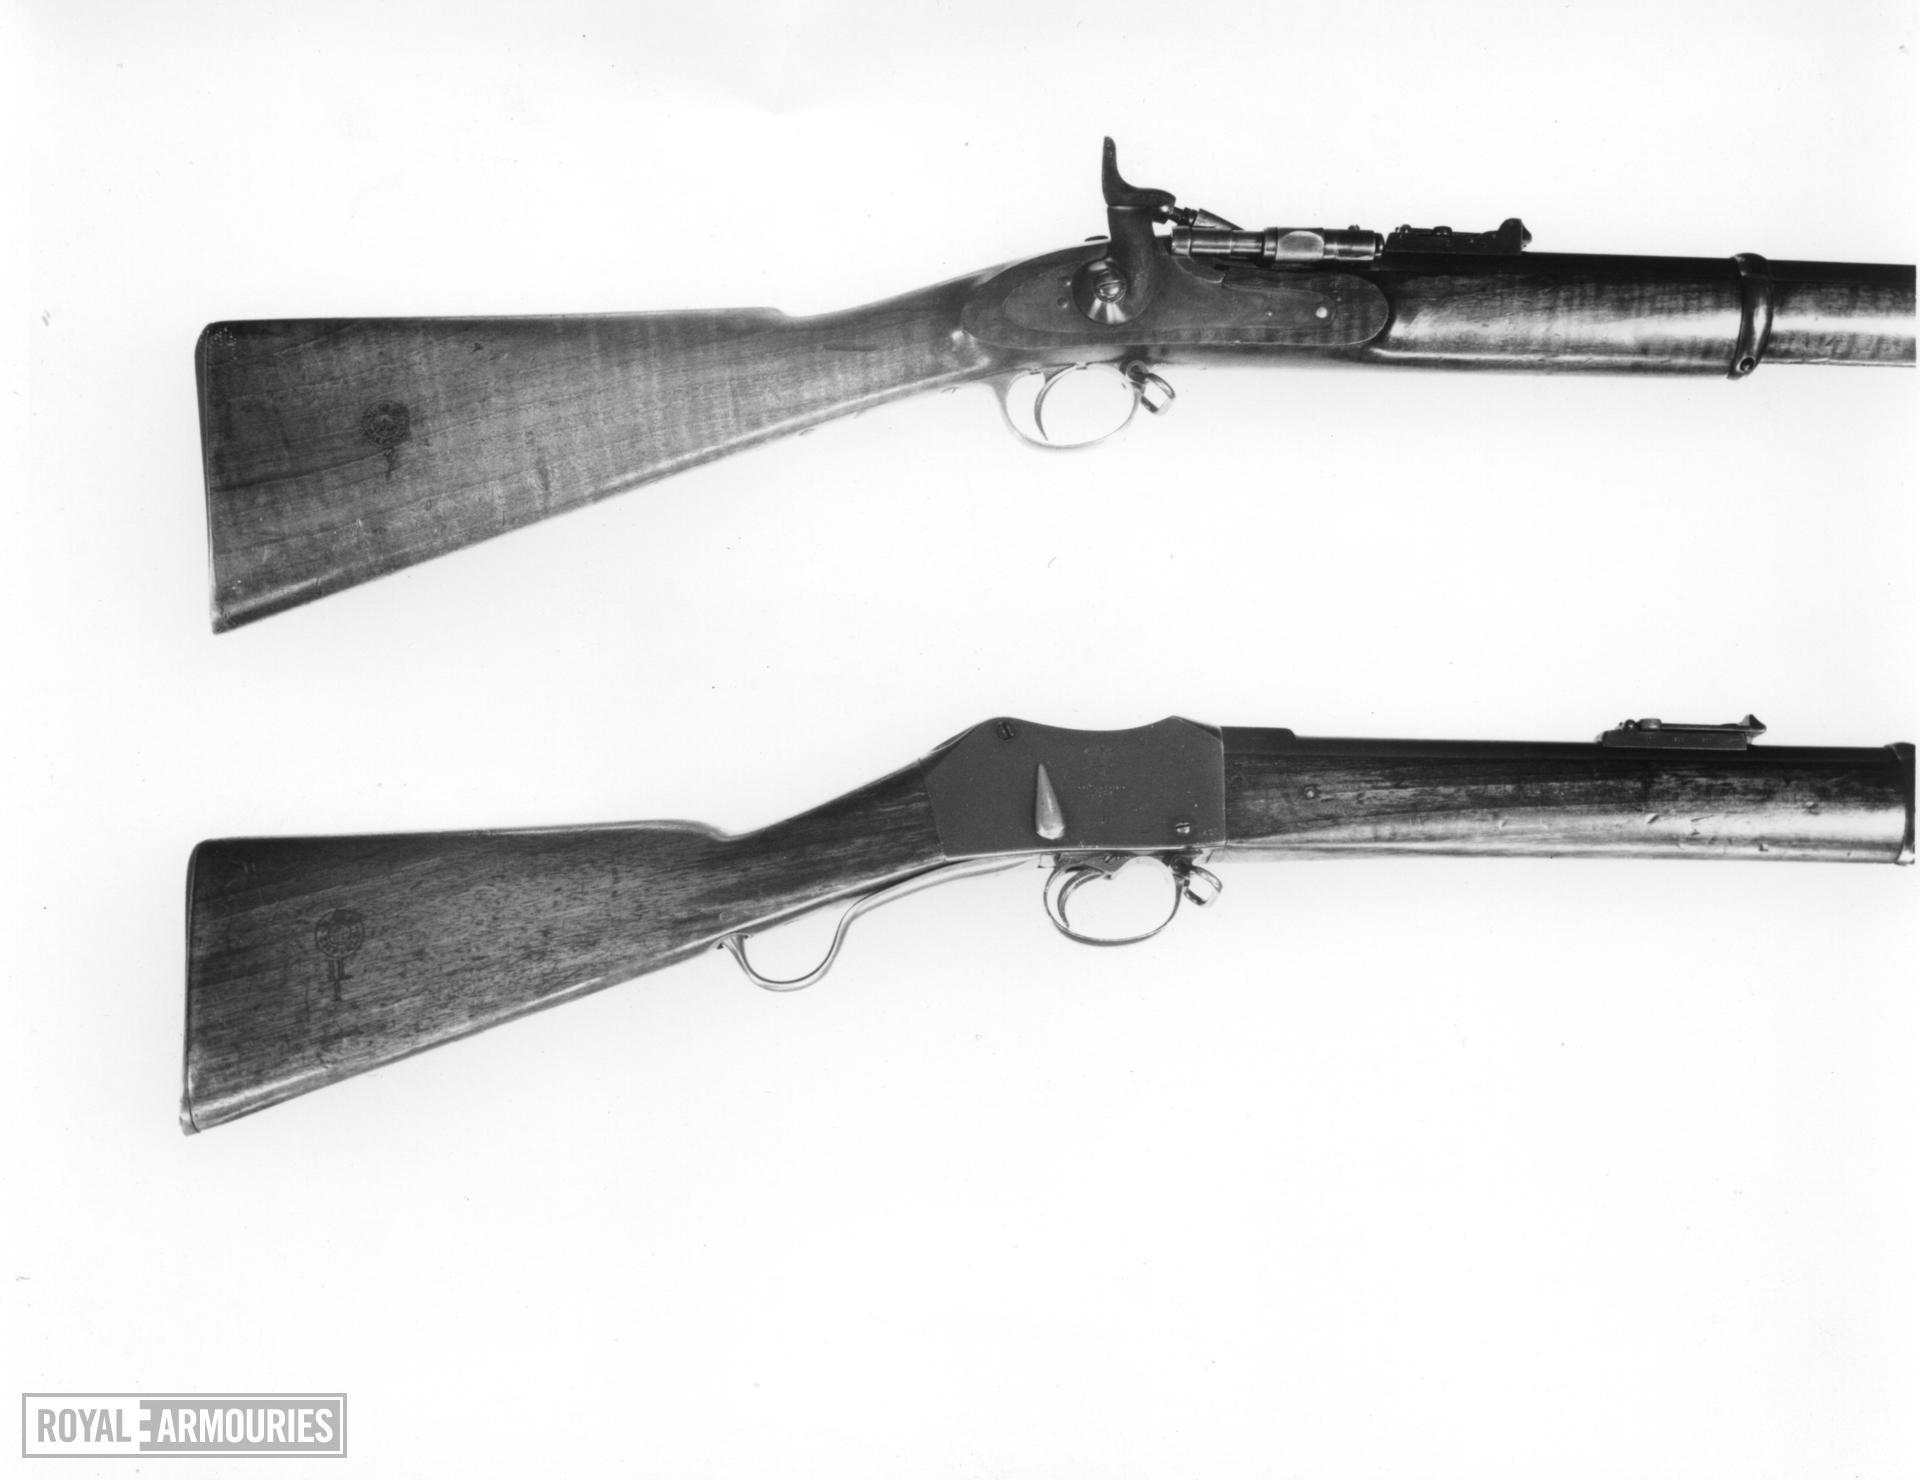 Centrefire underlever breech-loading military rifle - Martini-Enfield Mk. II